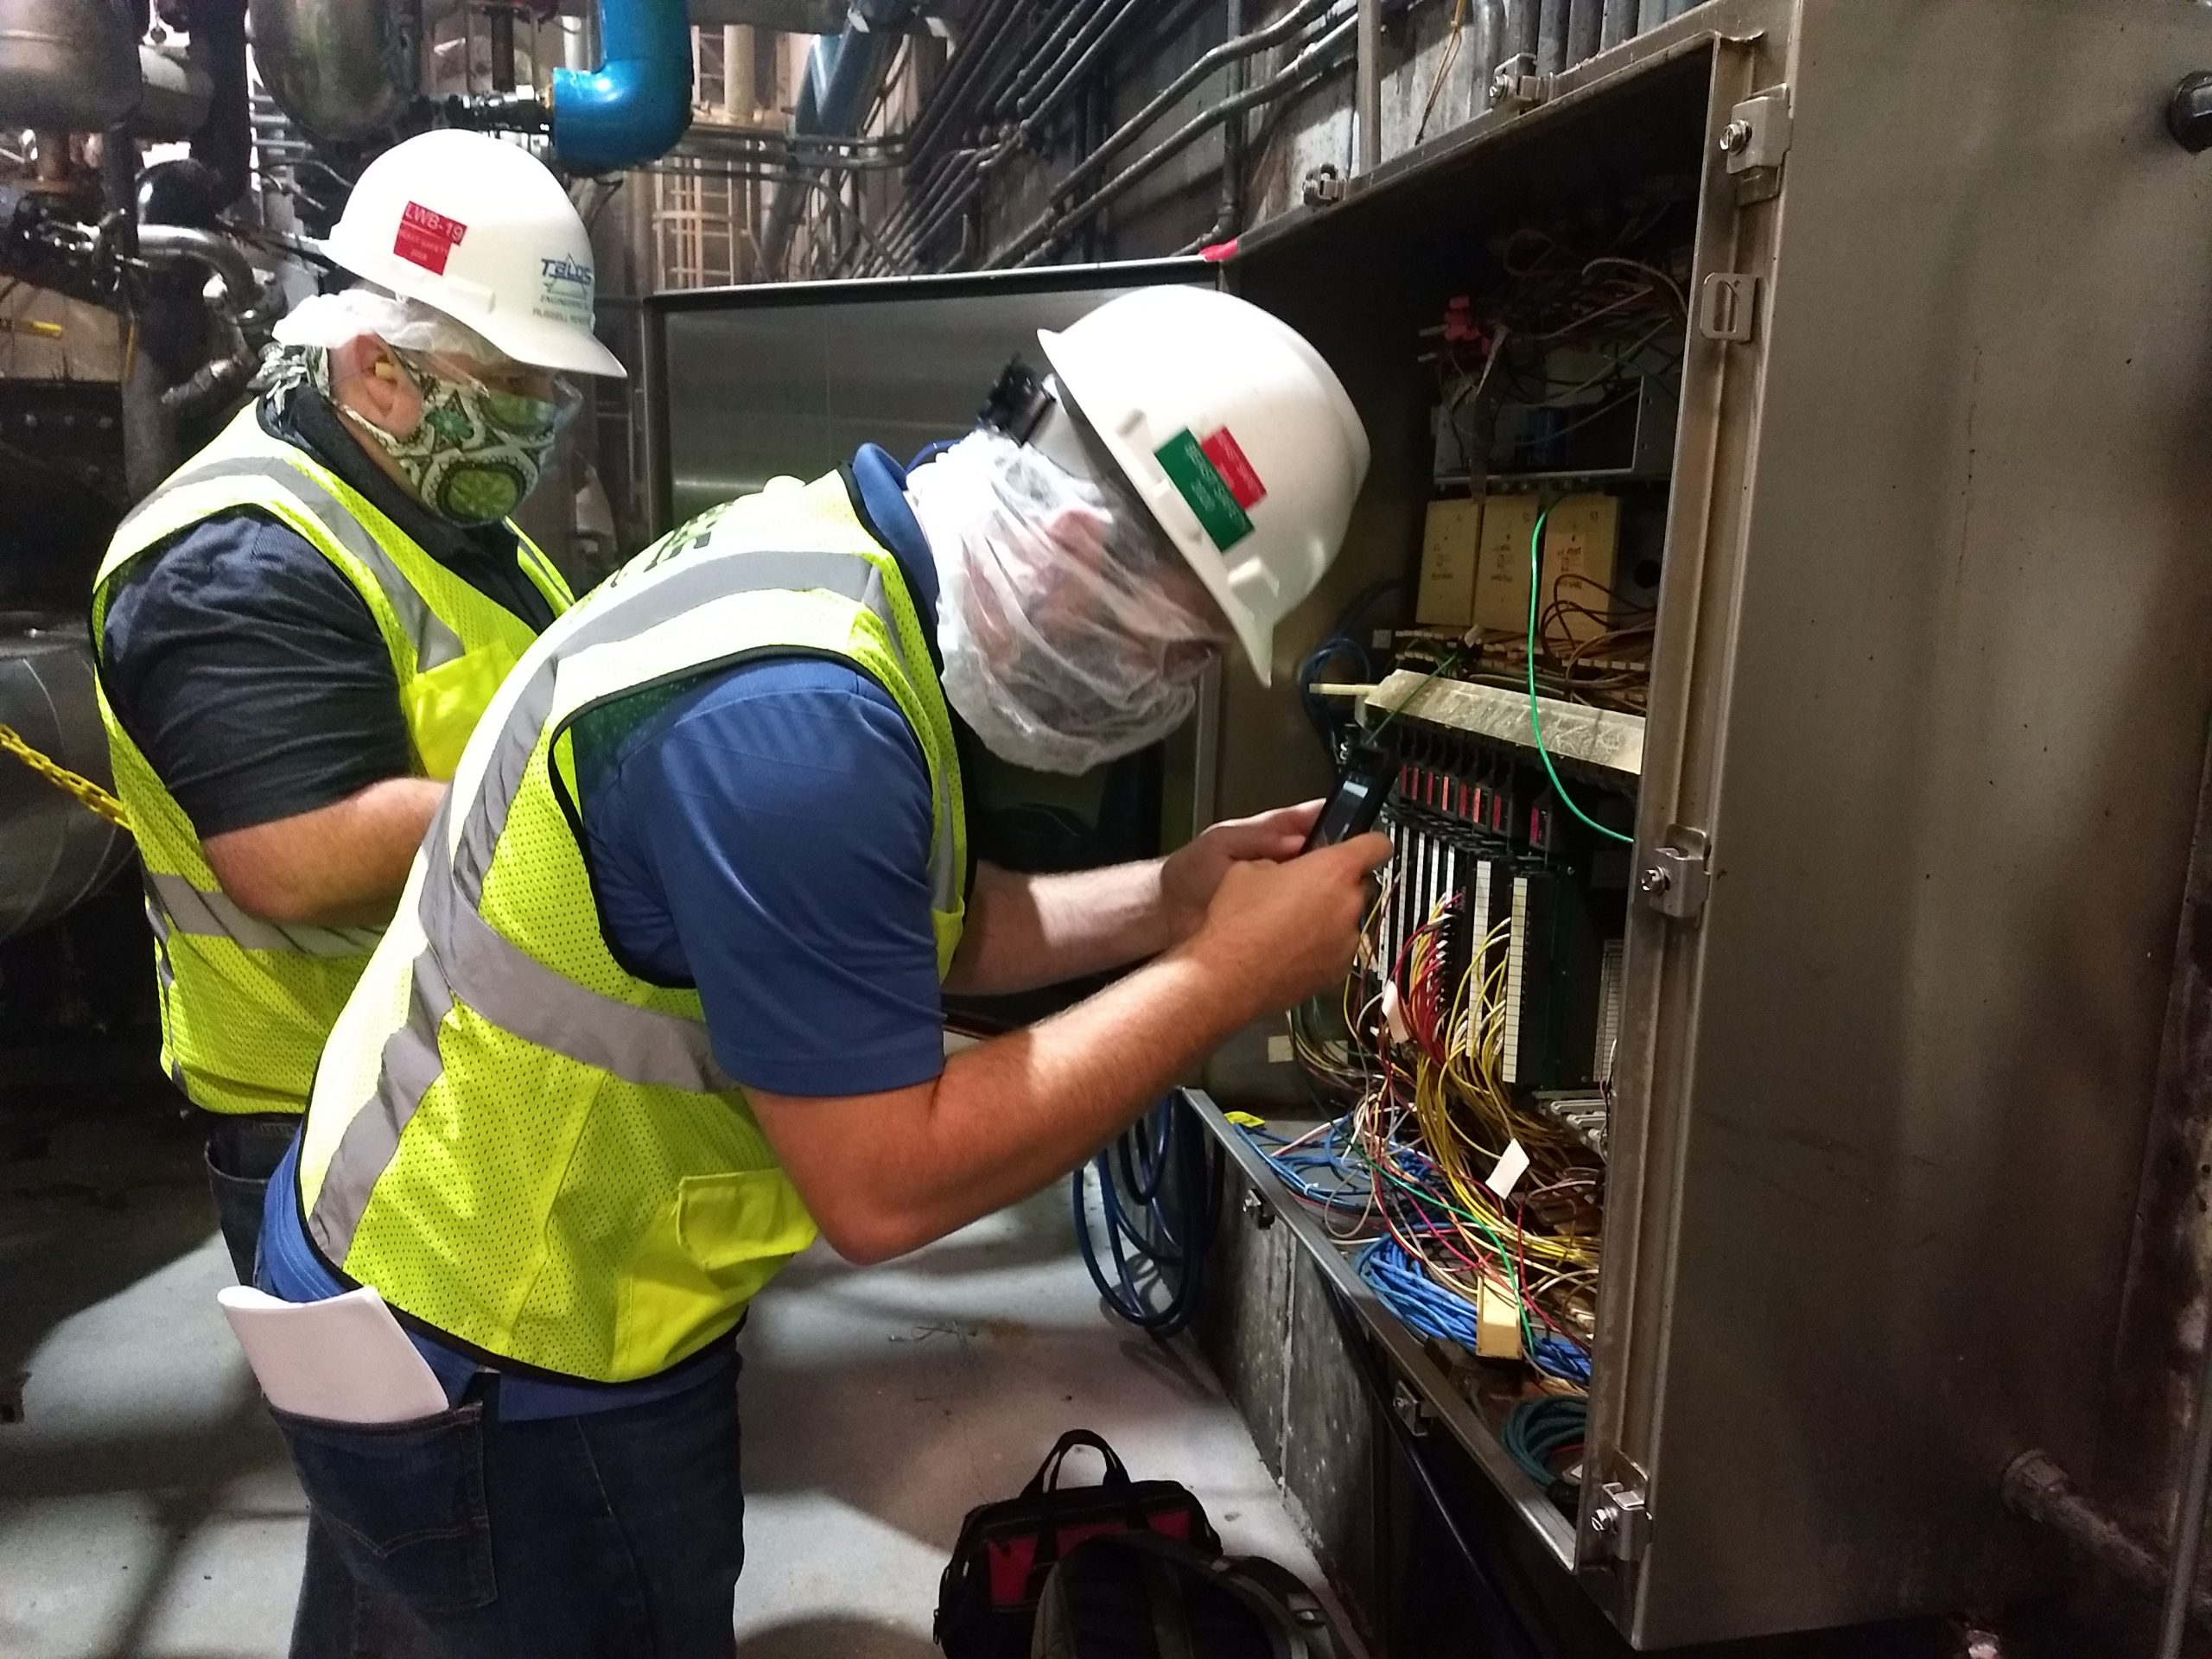 two talos employees working in hard hats